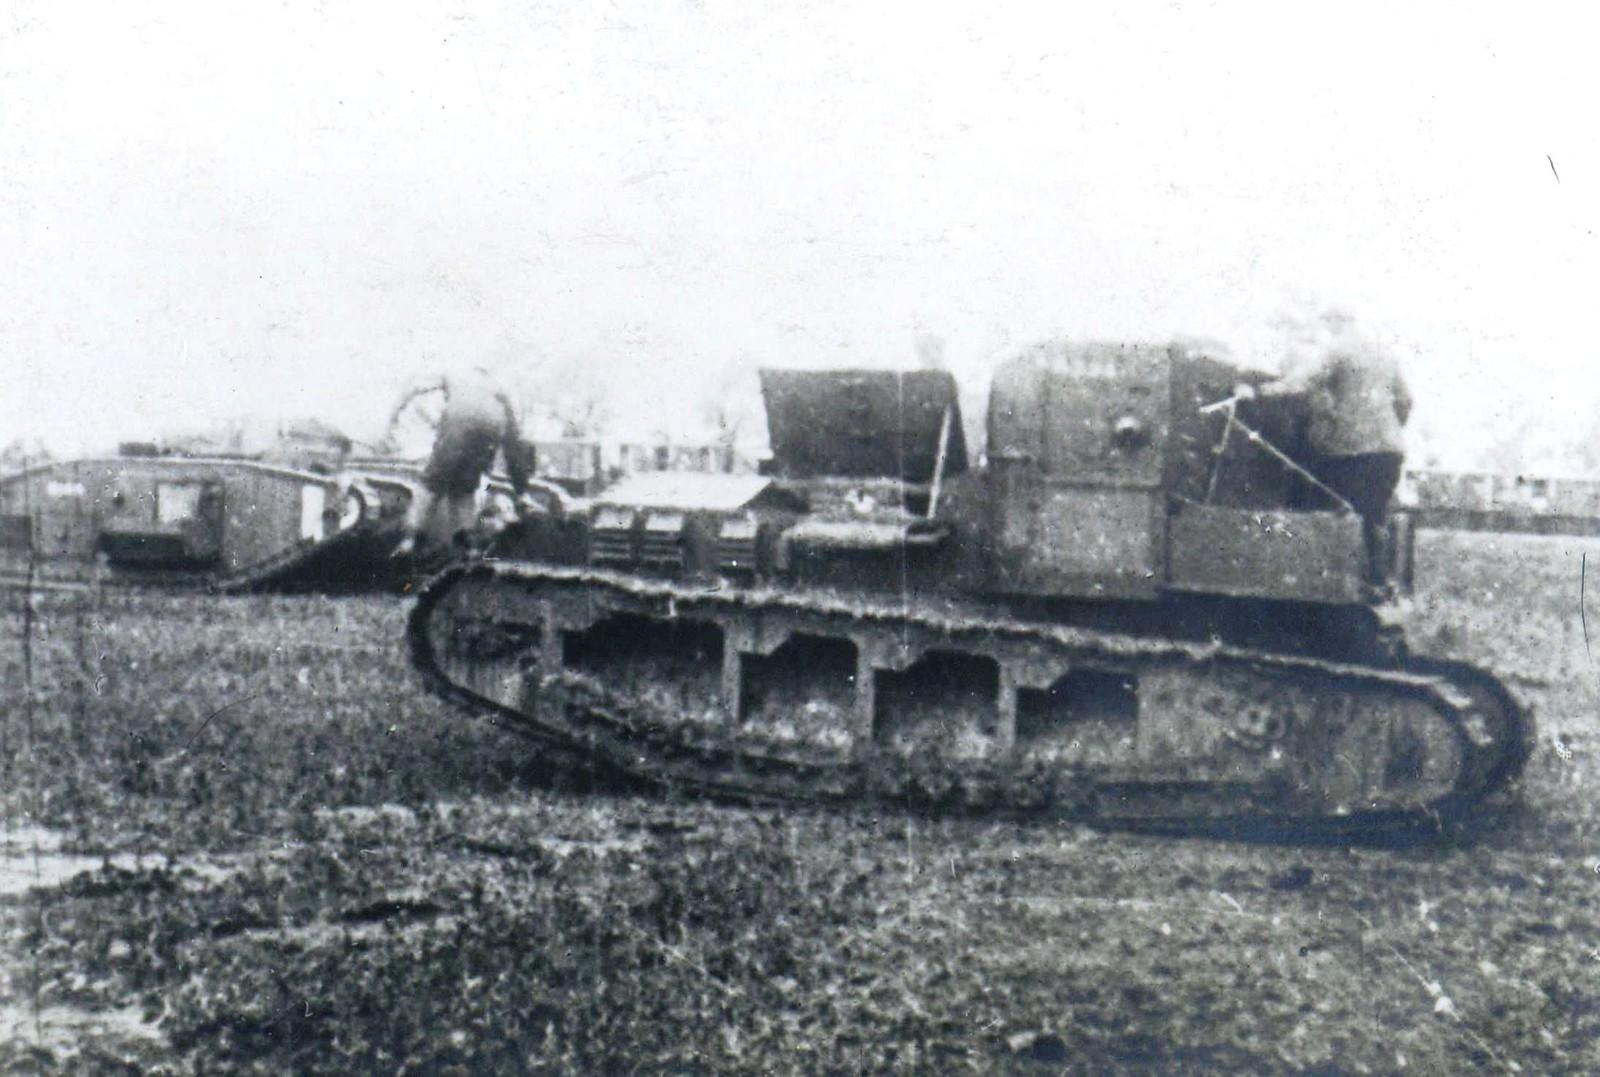 324. 1919. Екатеринодар. Танки МК-А «Уиппет» и MK-V в «Школе английских танков»